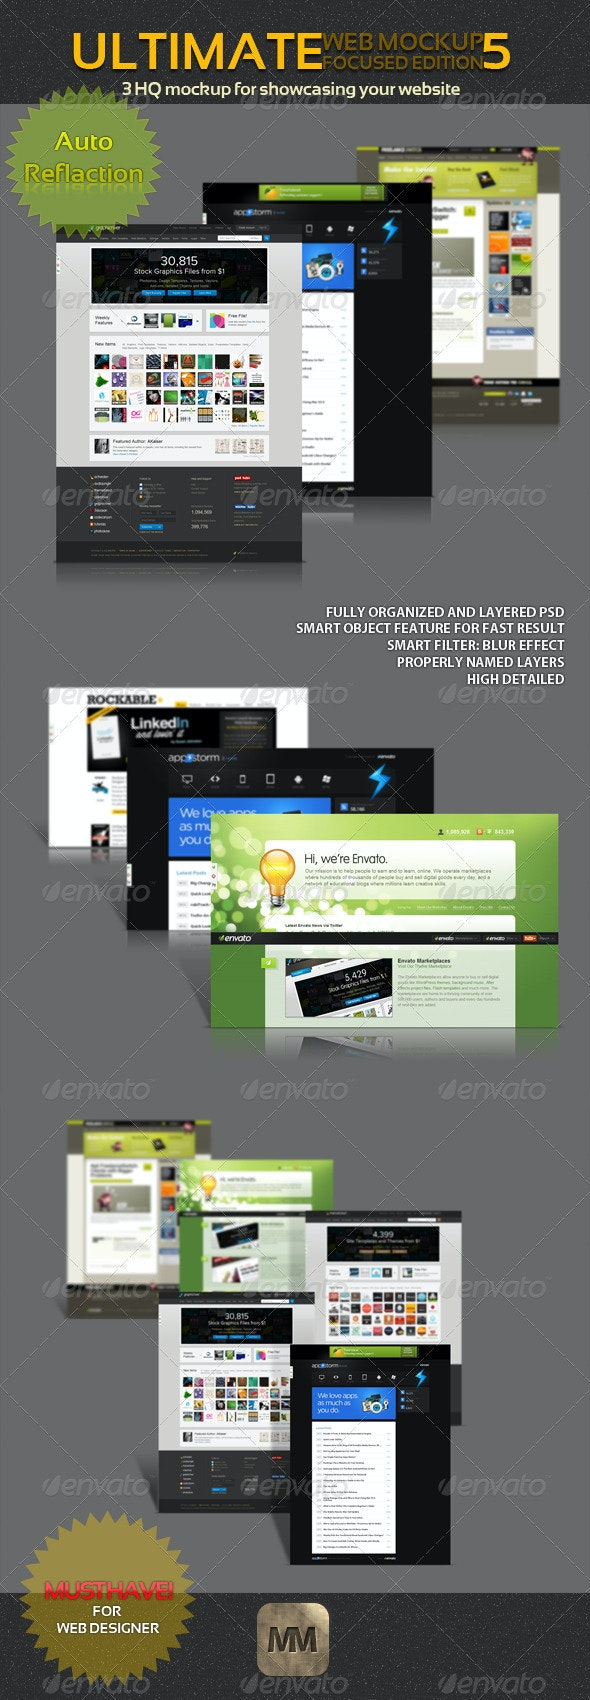 Web Mockup pack - 5 - Website Displays